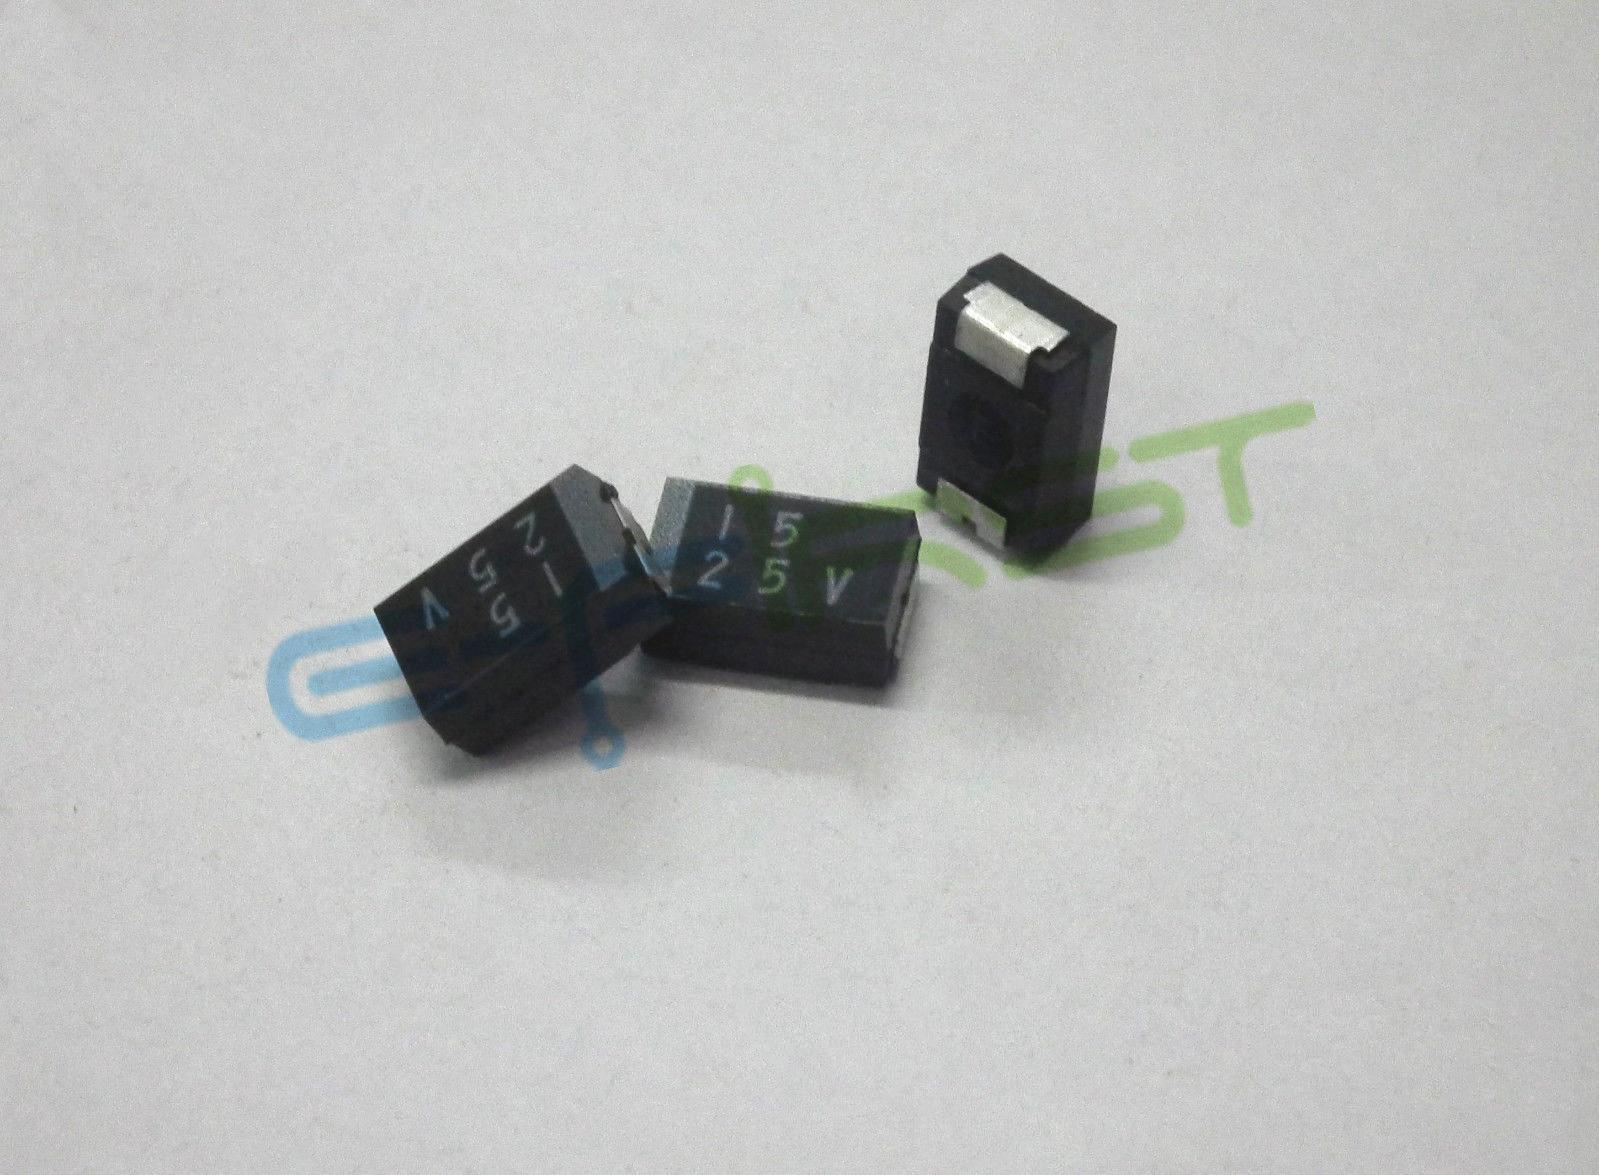 10 шт. 25 в 15 мкФ 1E156 ELNA SY2 1E156M RD0 SMD Танталовый конденсатор|Конденсаторы| |